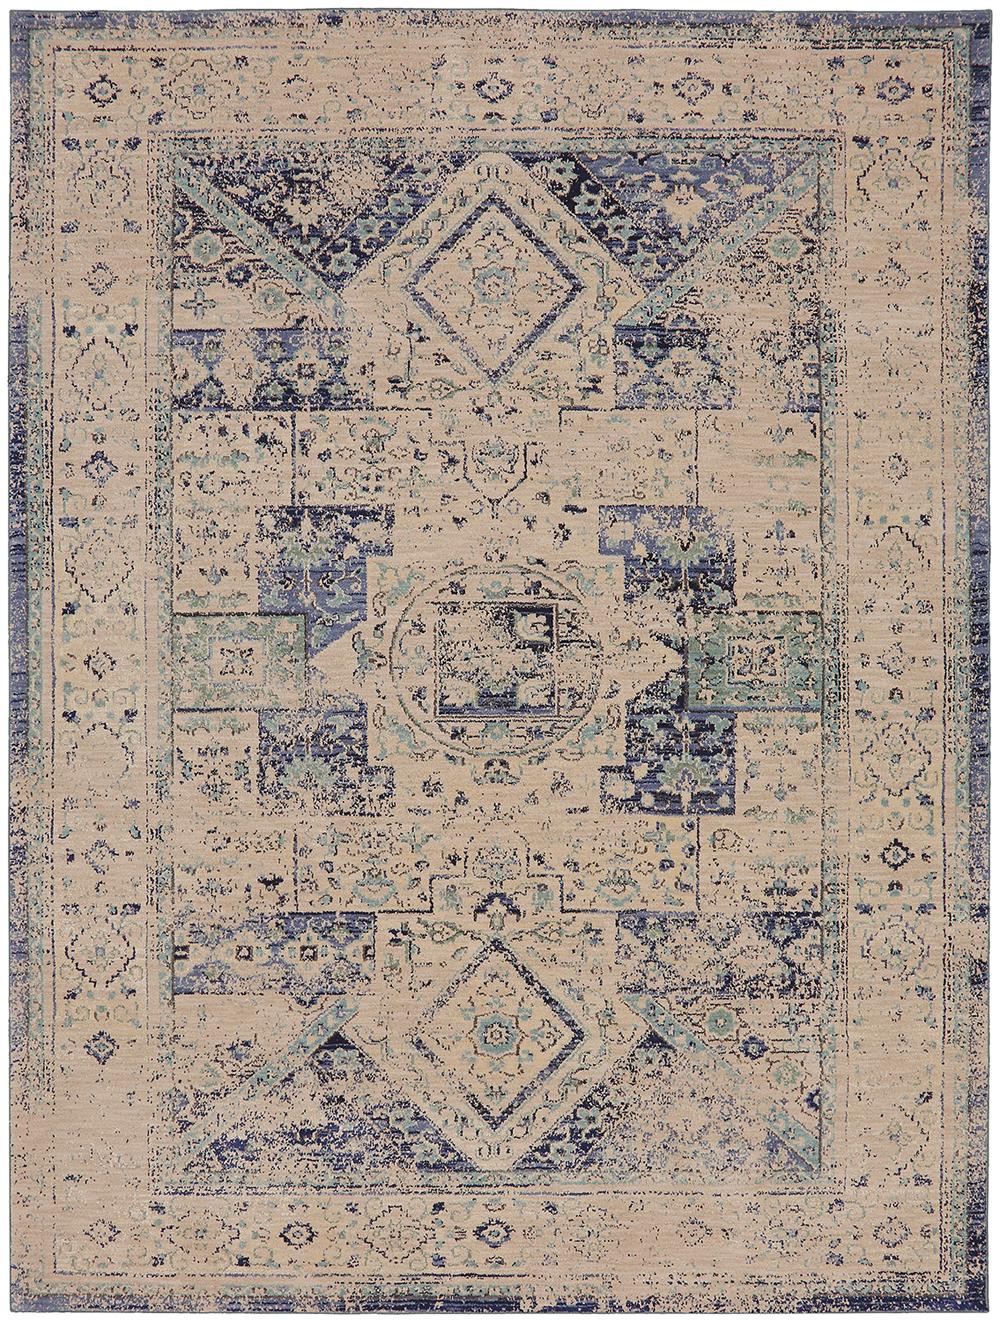 Karastan Cosmopolitan Santee Indigo Antique White Rug